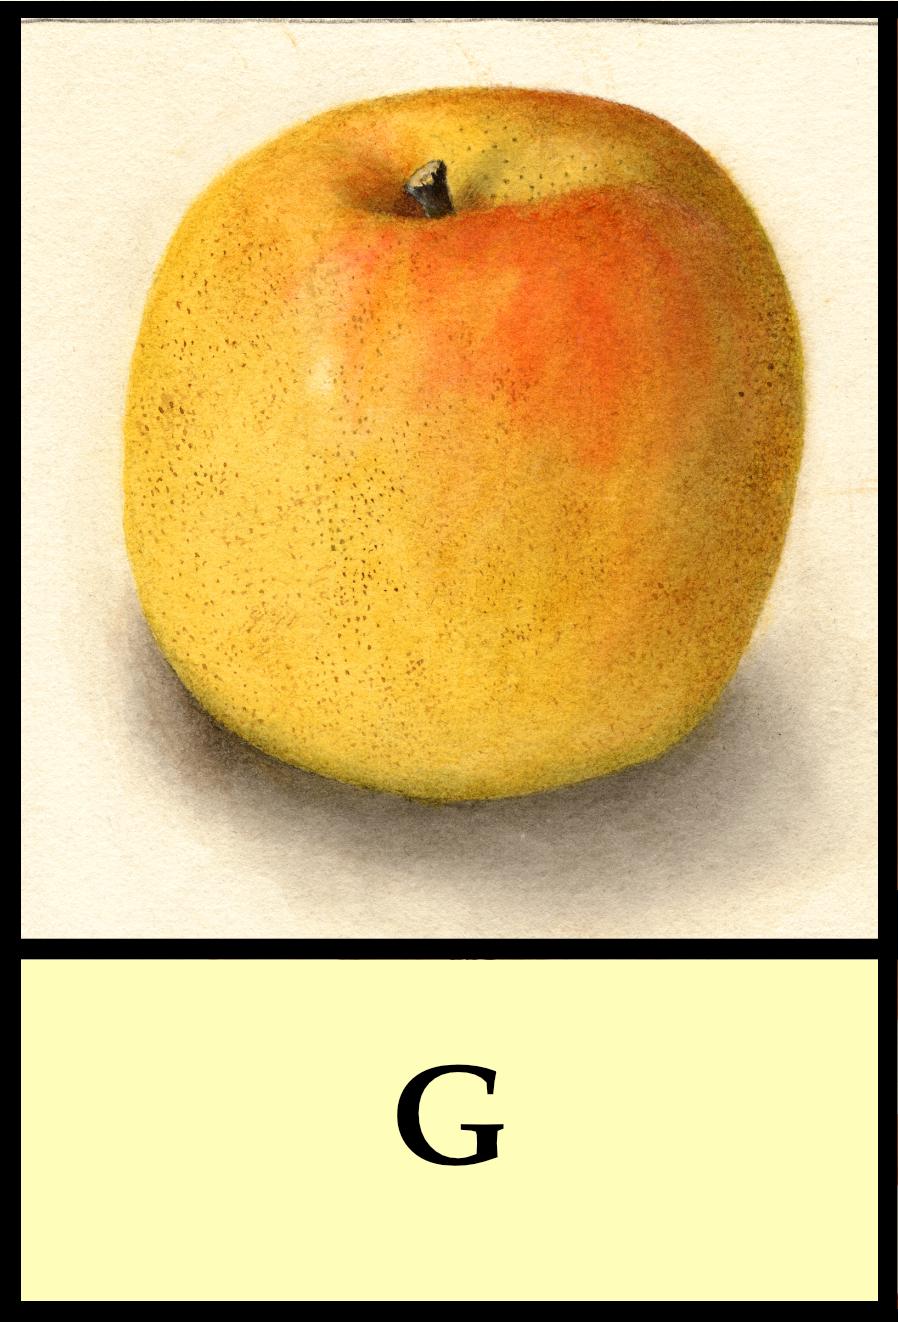 G apples